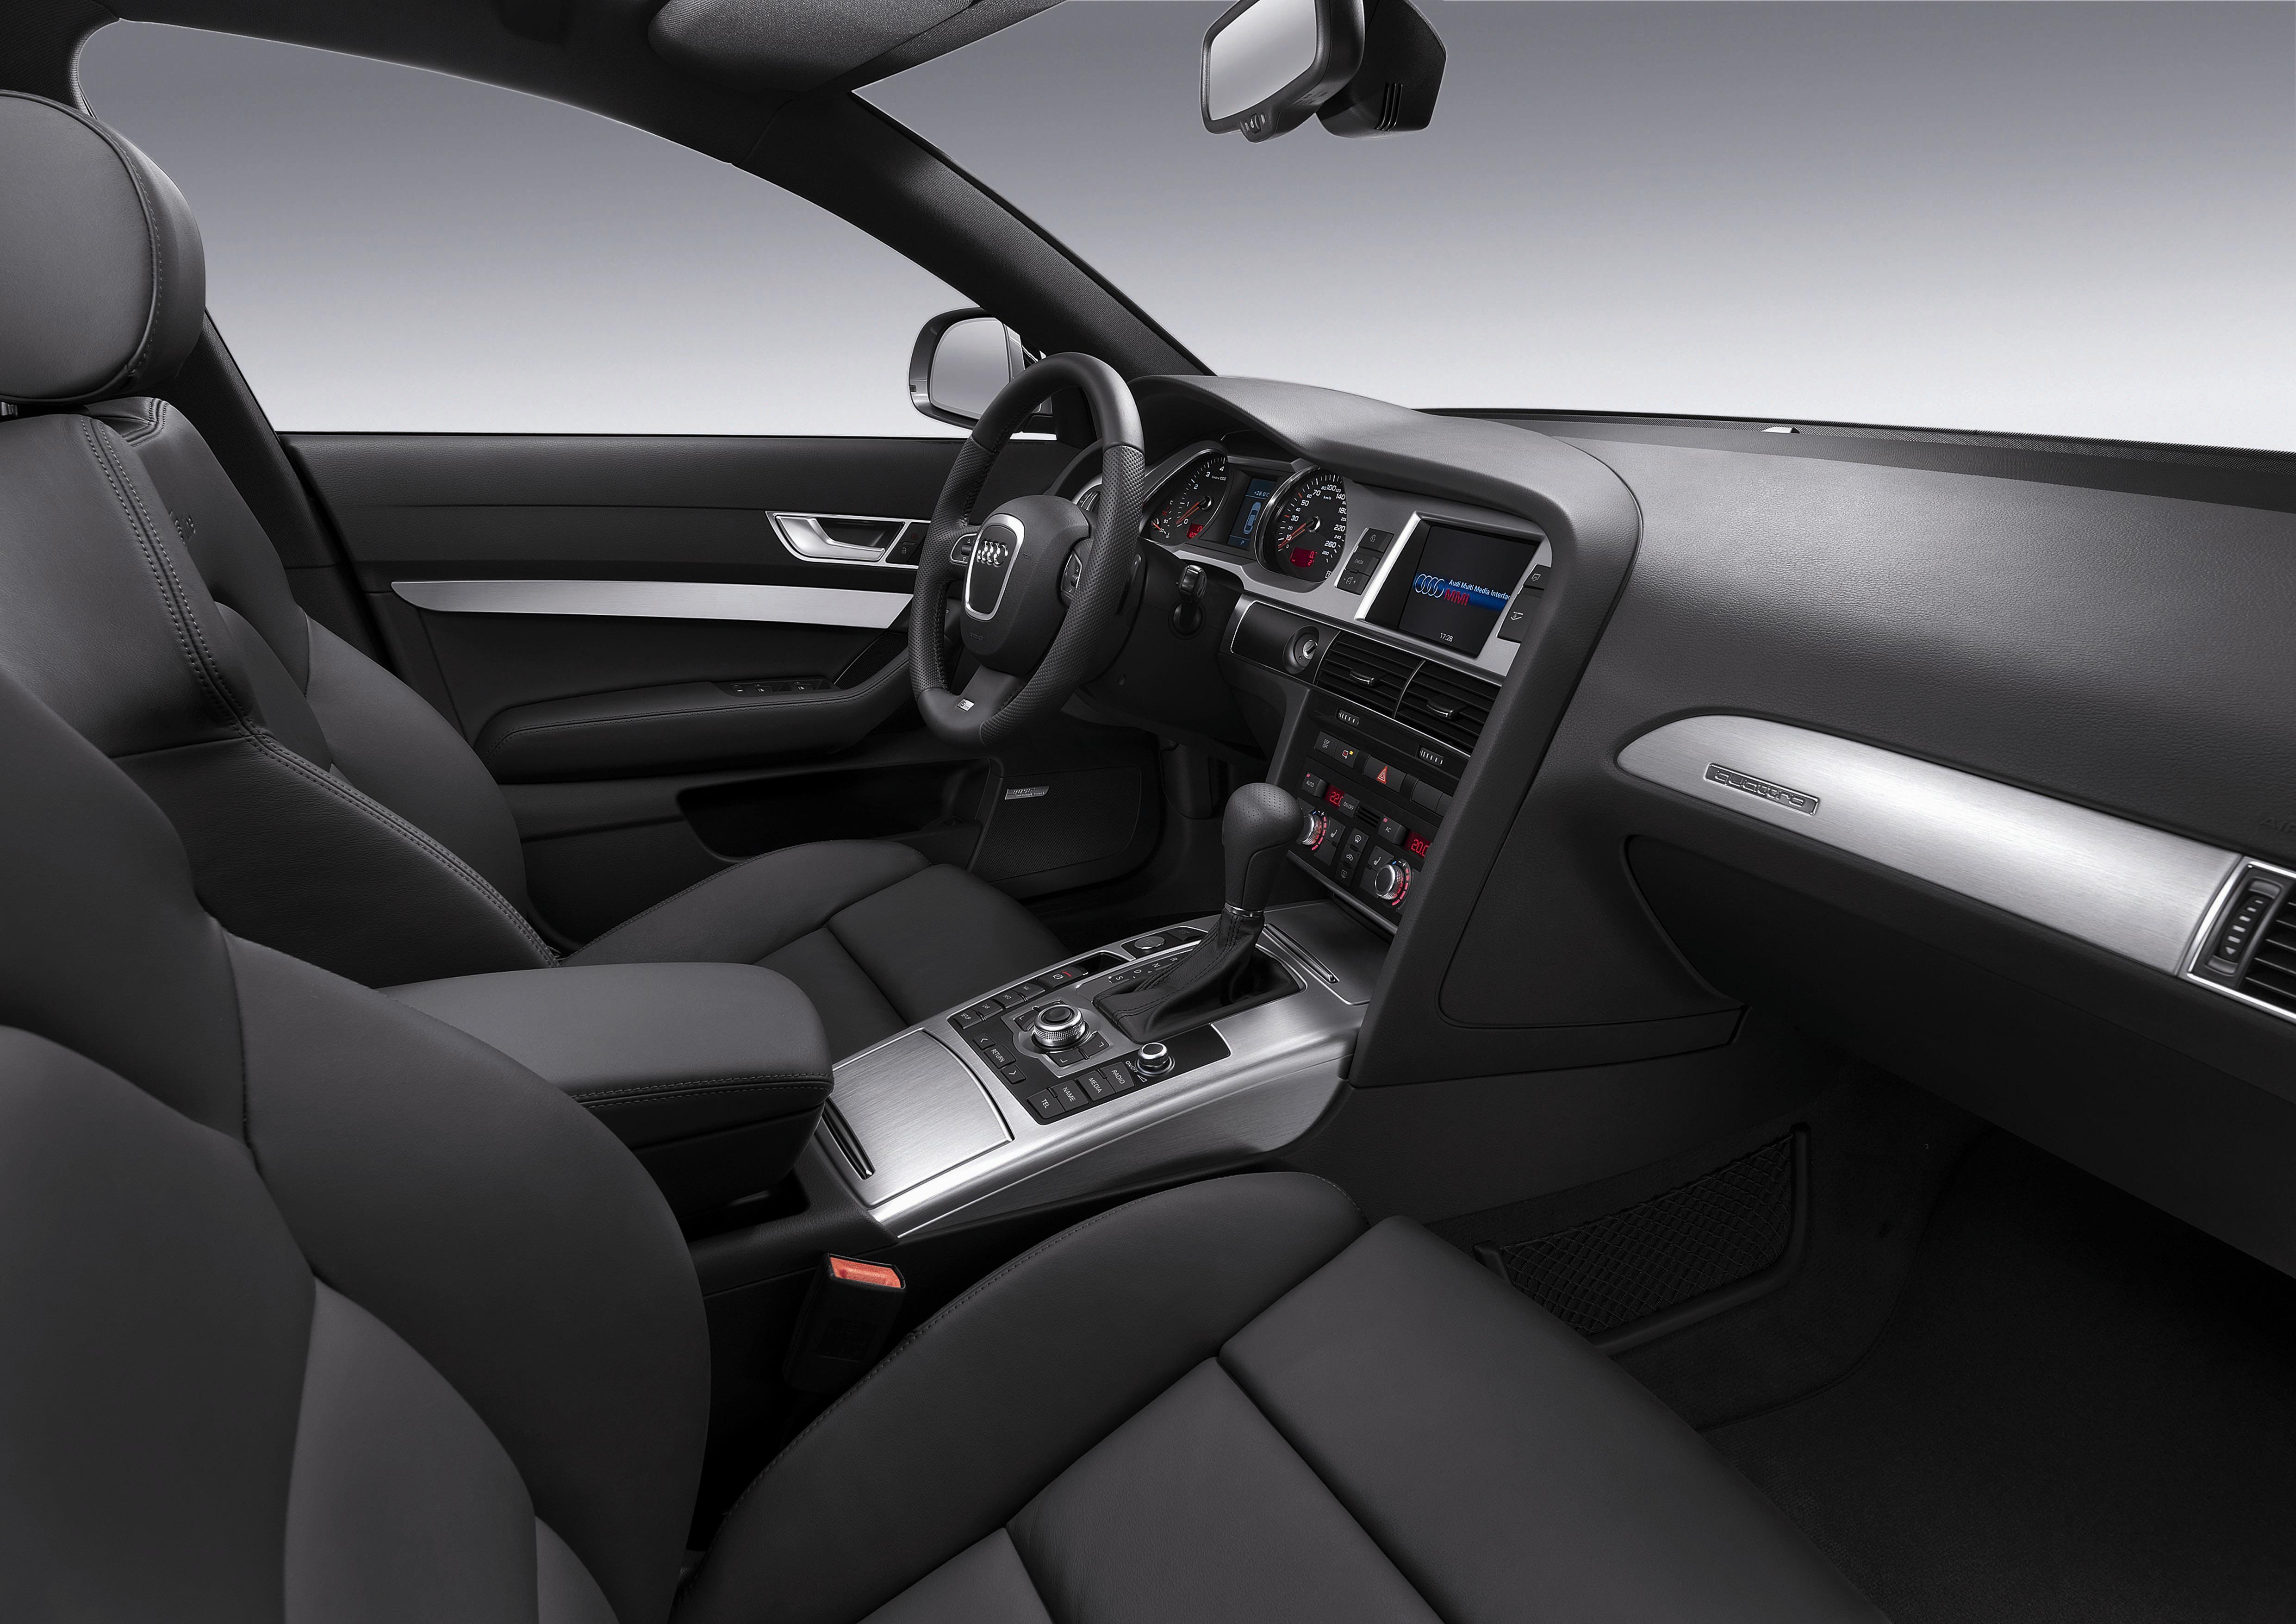 Audi A6 2019 Interior Dashboard